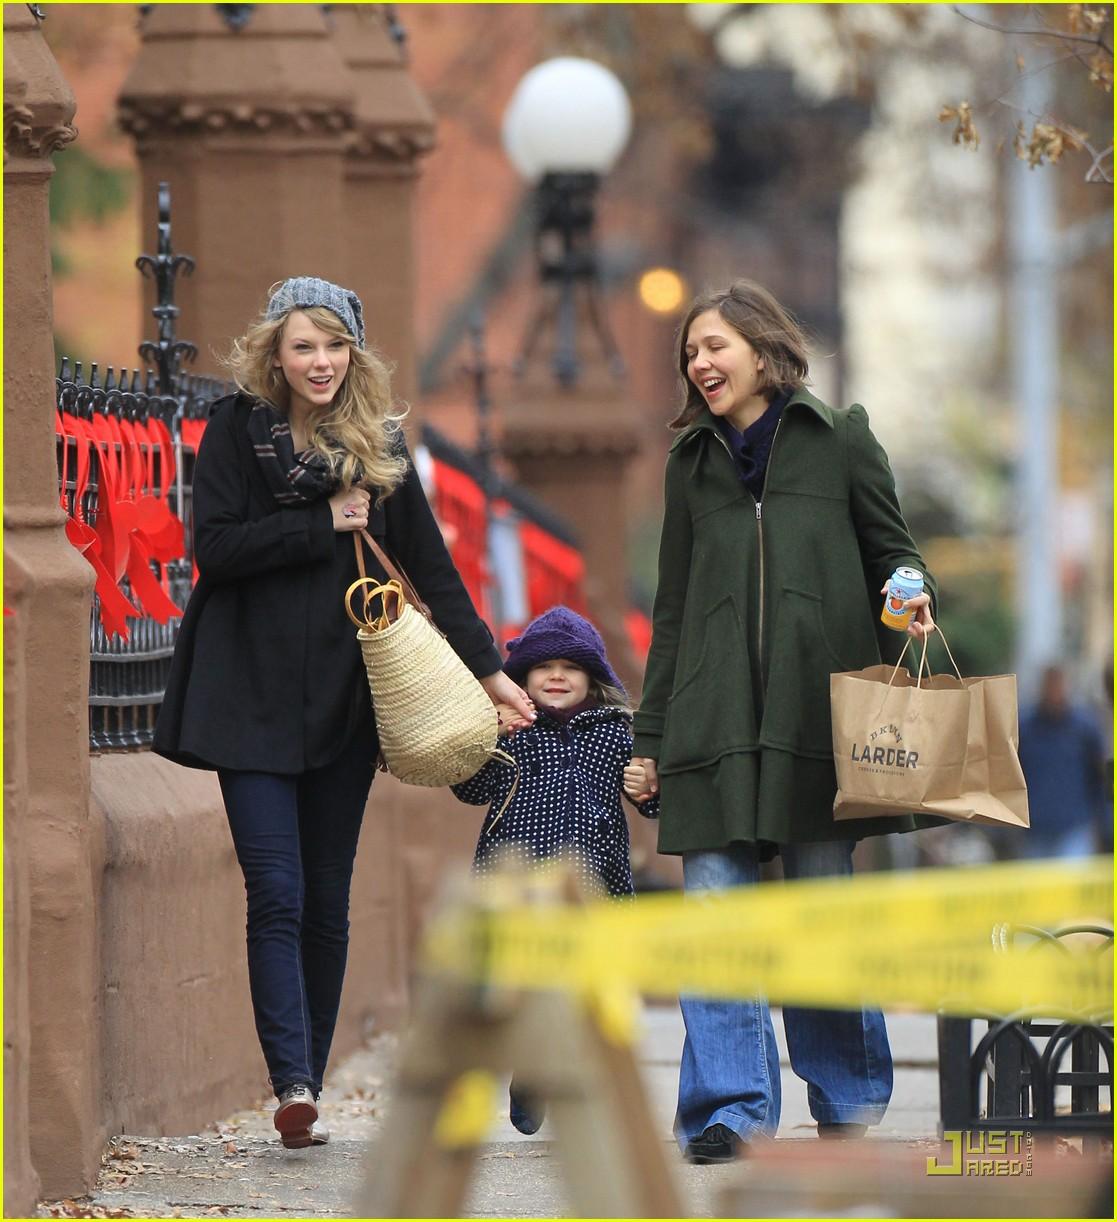 http://3.bp.blogspot.com/_tKjwbeZ29rY/TQDtHwsVTxI/AAAAAAAADgc/uYdICt5m7rQ/s1600/jake-gyllenhaal-taylor-swift-thanksgiving-03.jpg